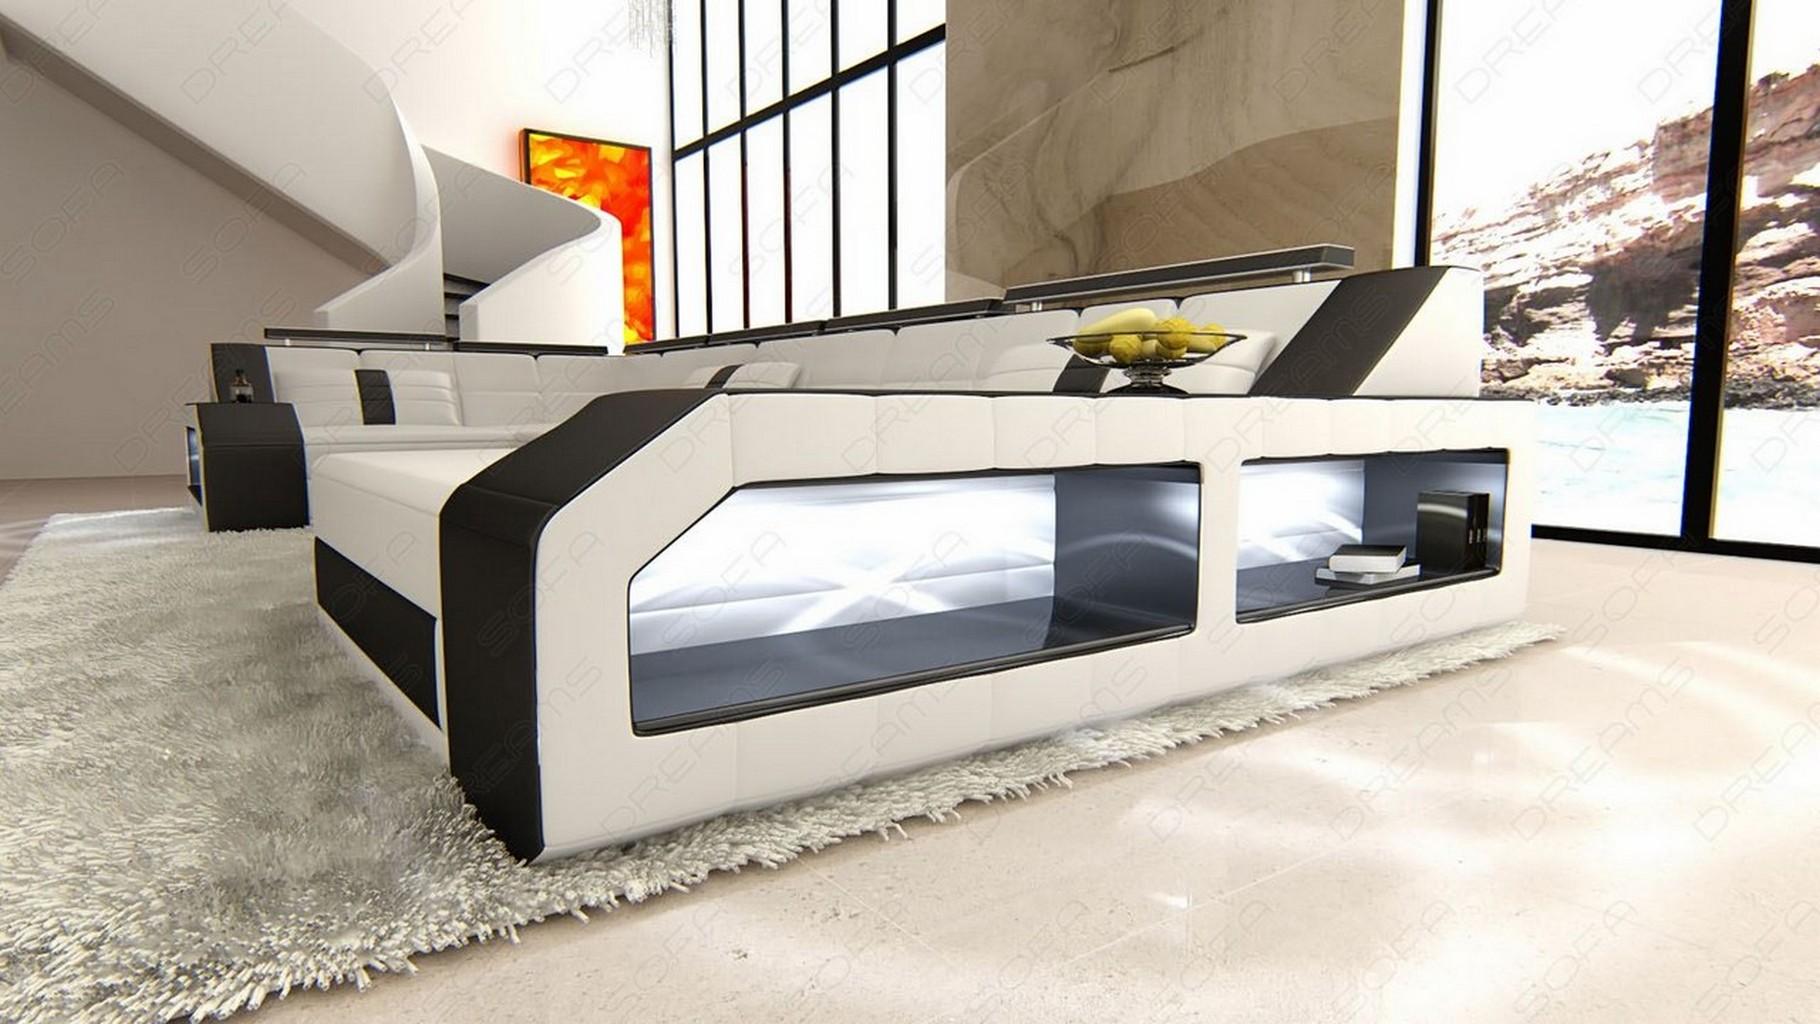 wohnlandschaft ledersofa couch arezzo u form ecksofa beleuchtung weiss schwarz ebay. Black Bedroom Furniture Sets. Home Design Ideas